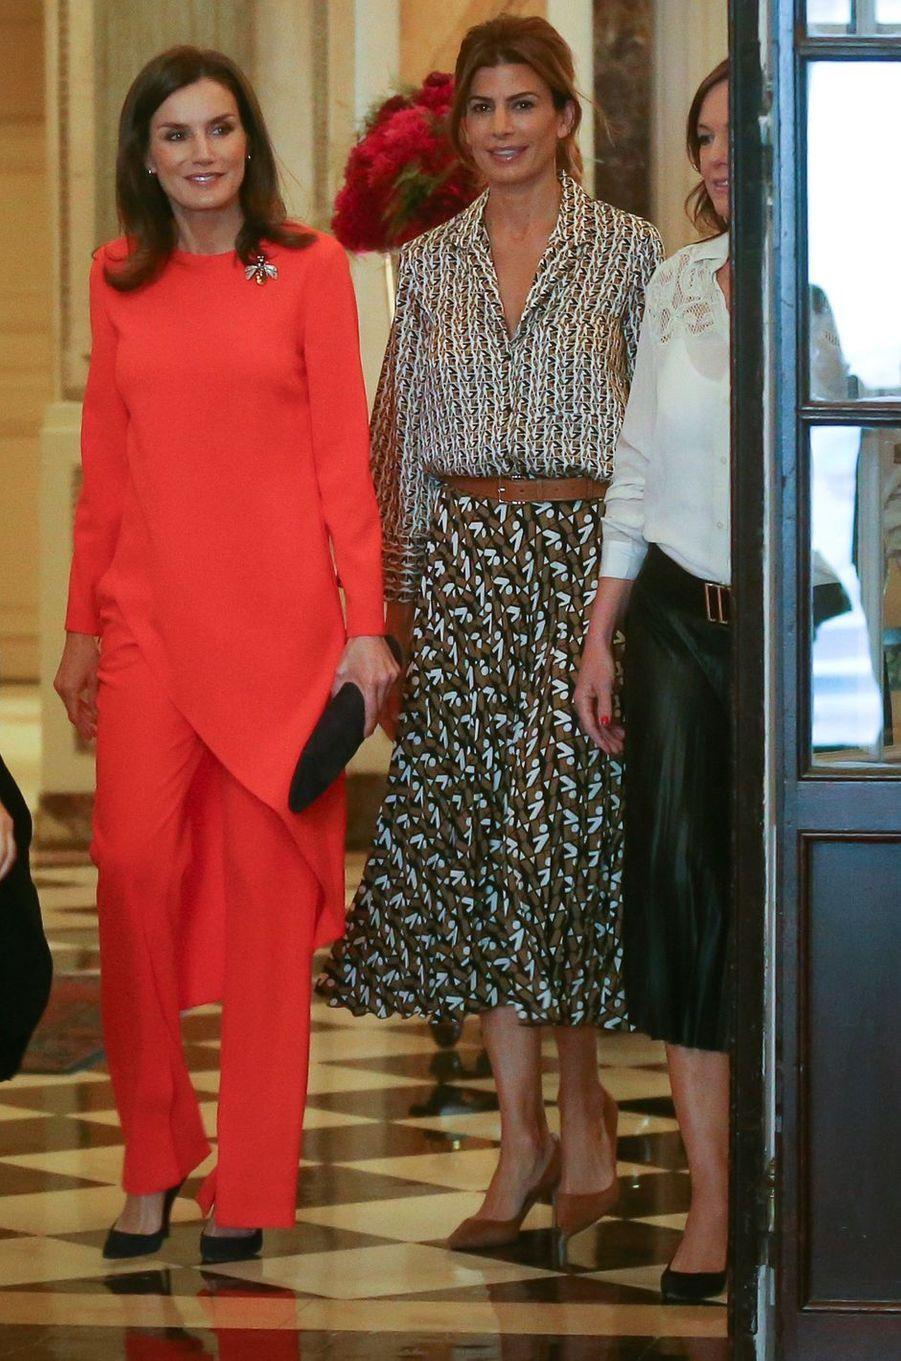 La reine Letizia d'Espagne, dans un ensemble pantalon Zara, le 26 mars 2019